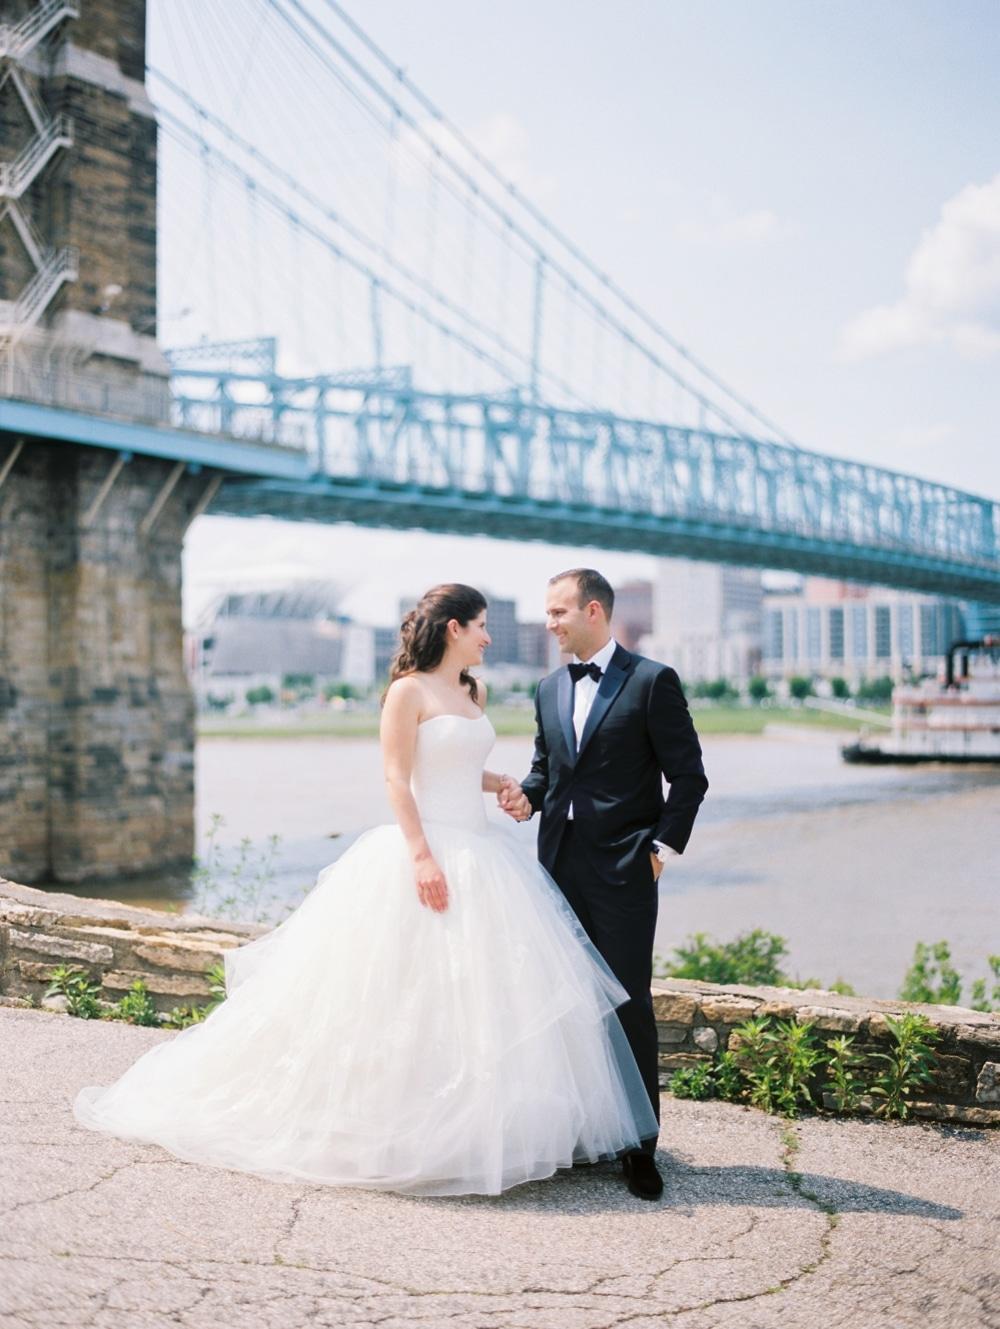 kristin-la-voie-photography-Cincinnati-Music-Hall-Wedding-106